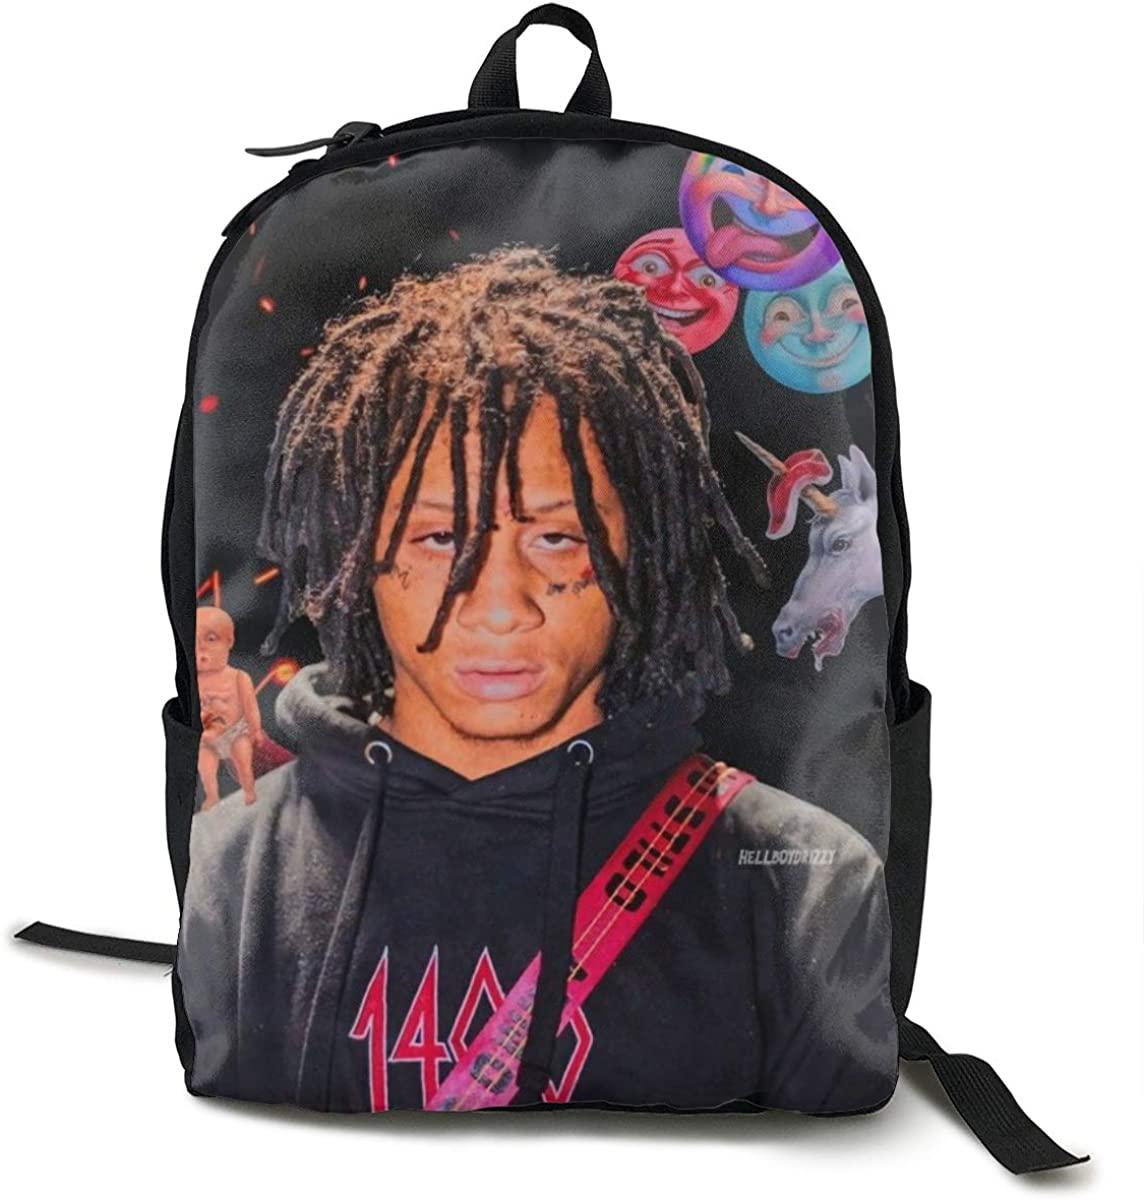 RhteGui Trippie Redd College Backpack Student Bookbag Multipurpose DaypacksTraveling Backpack